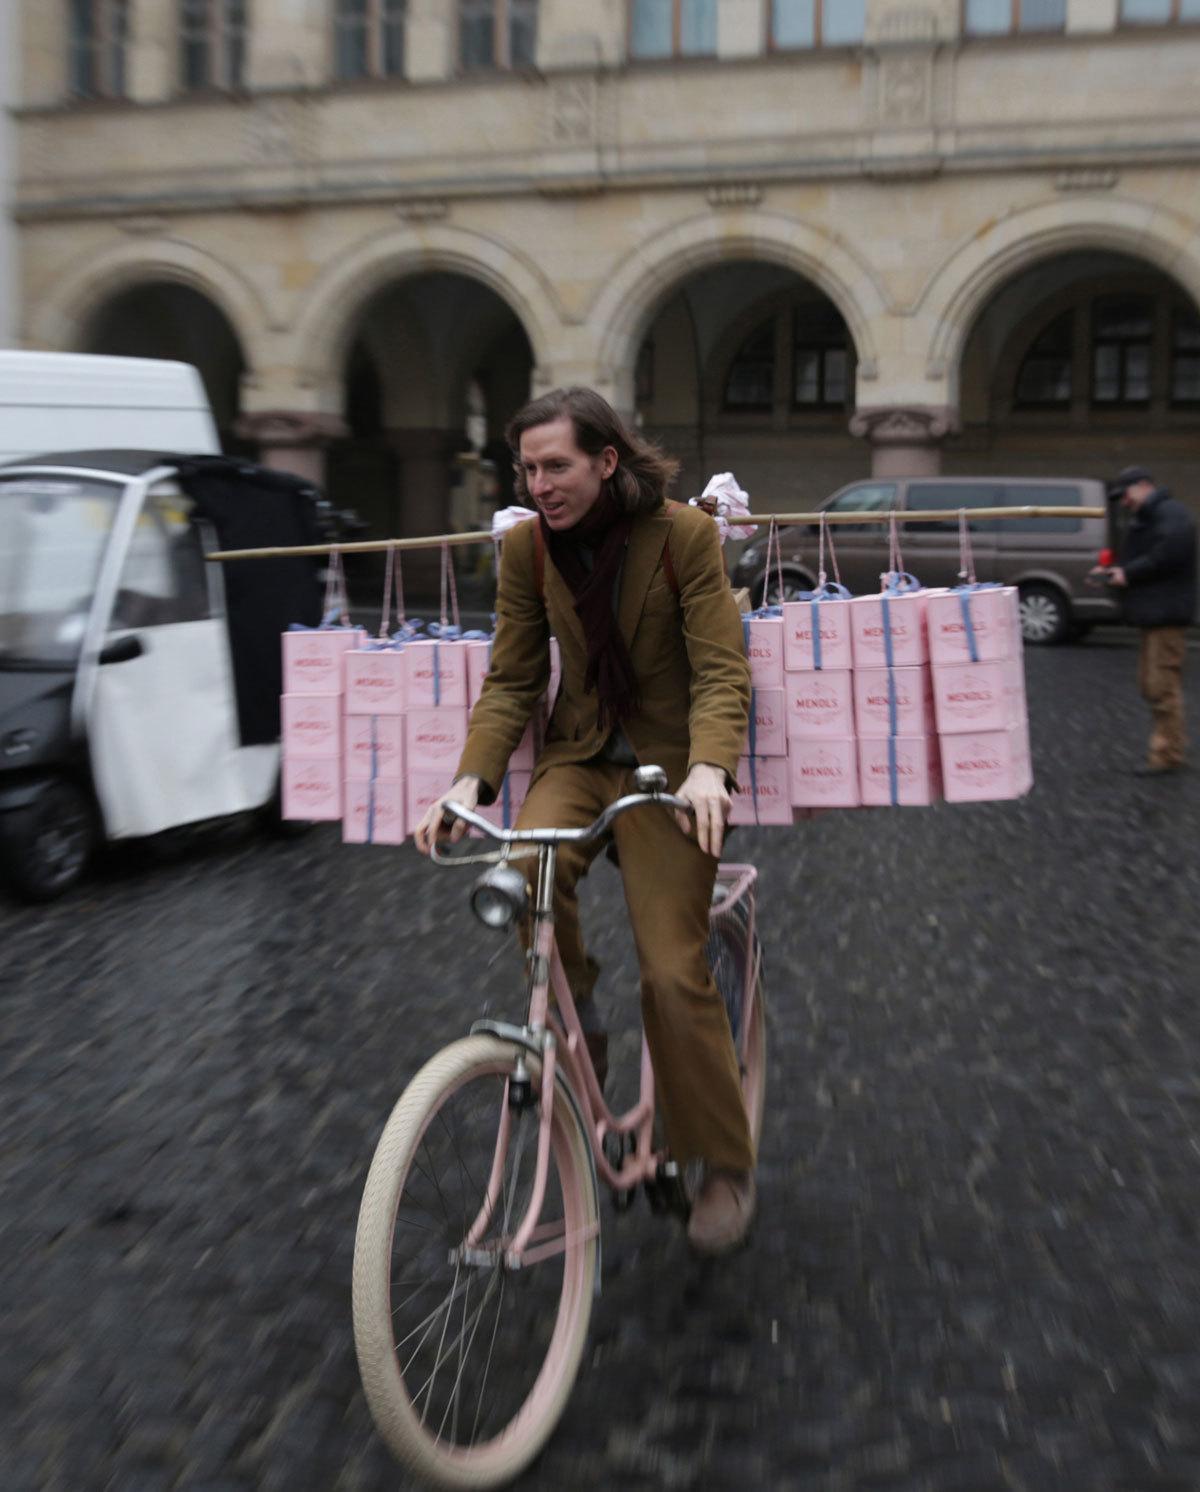 bicycle thief essay